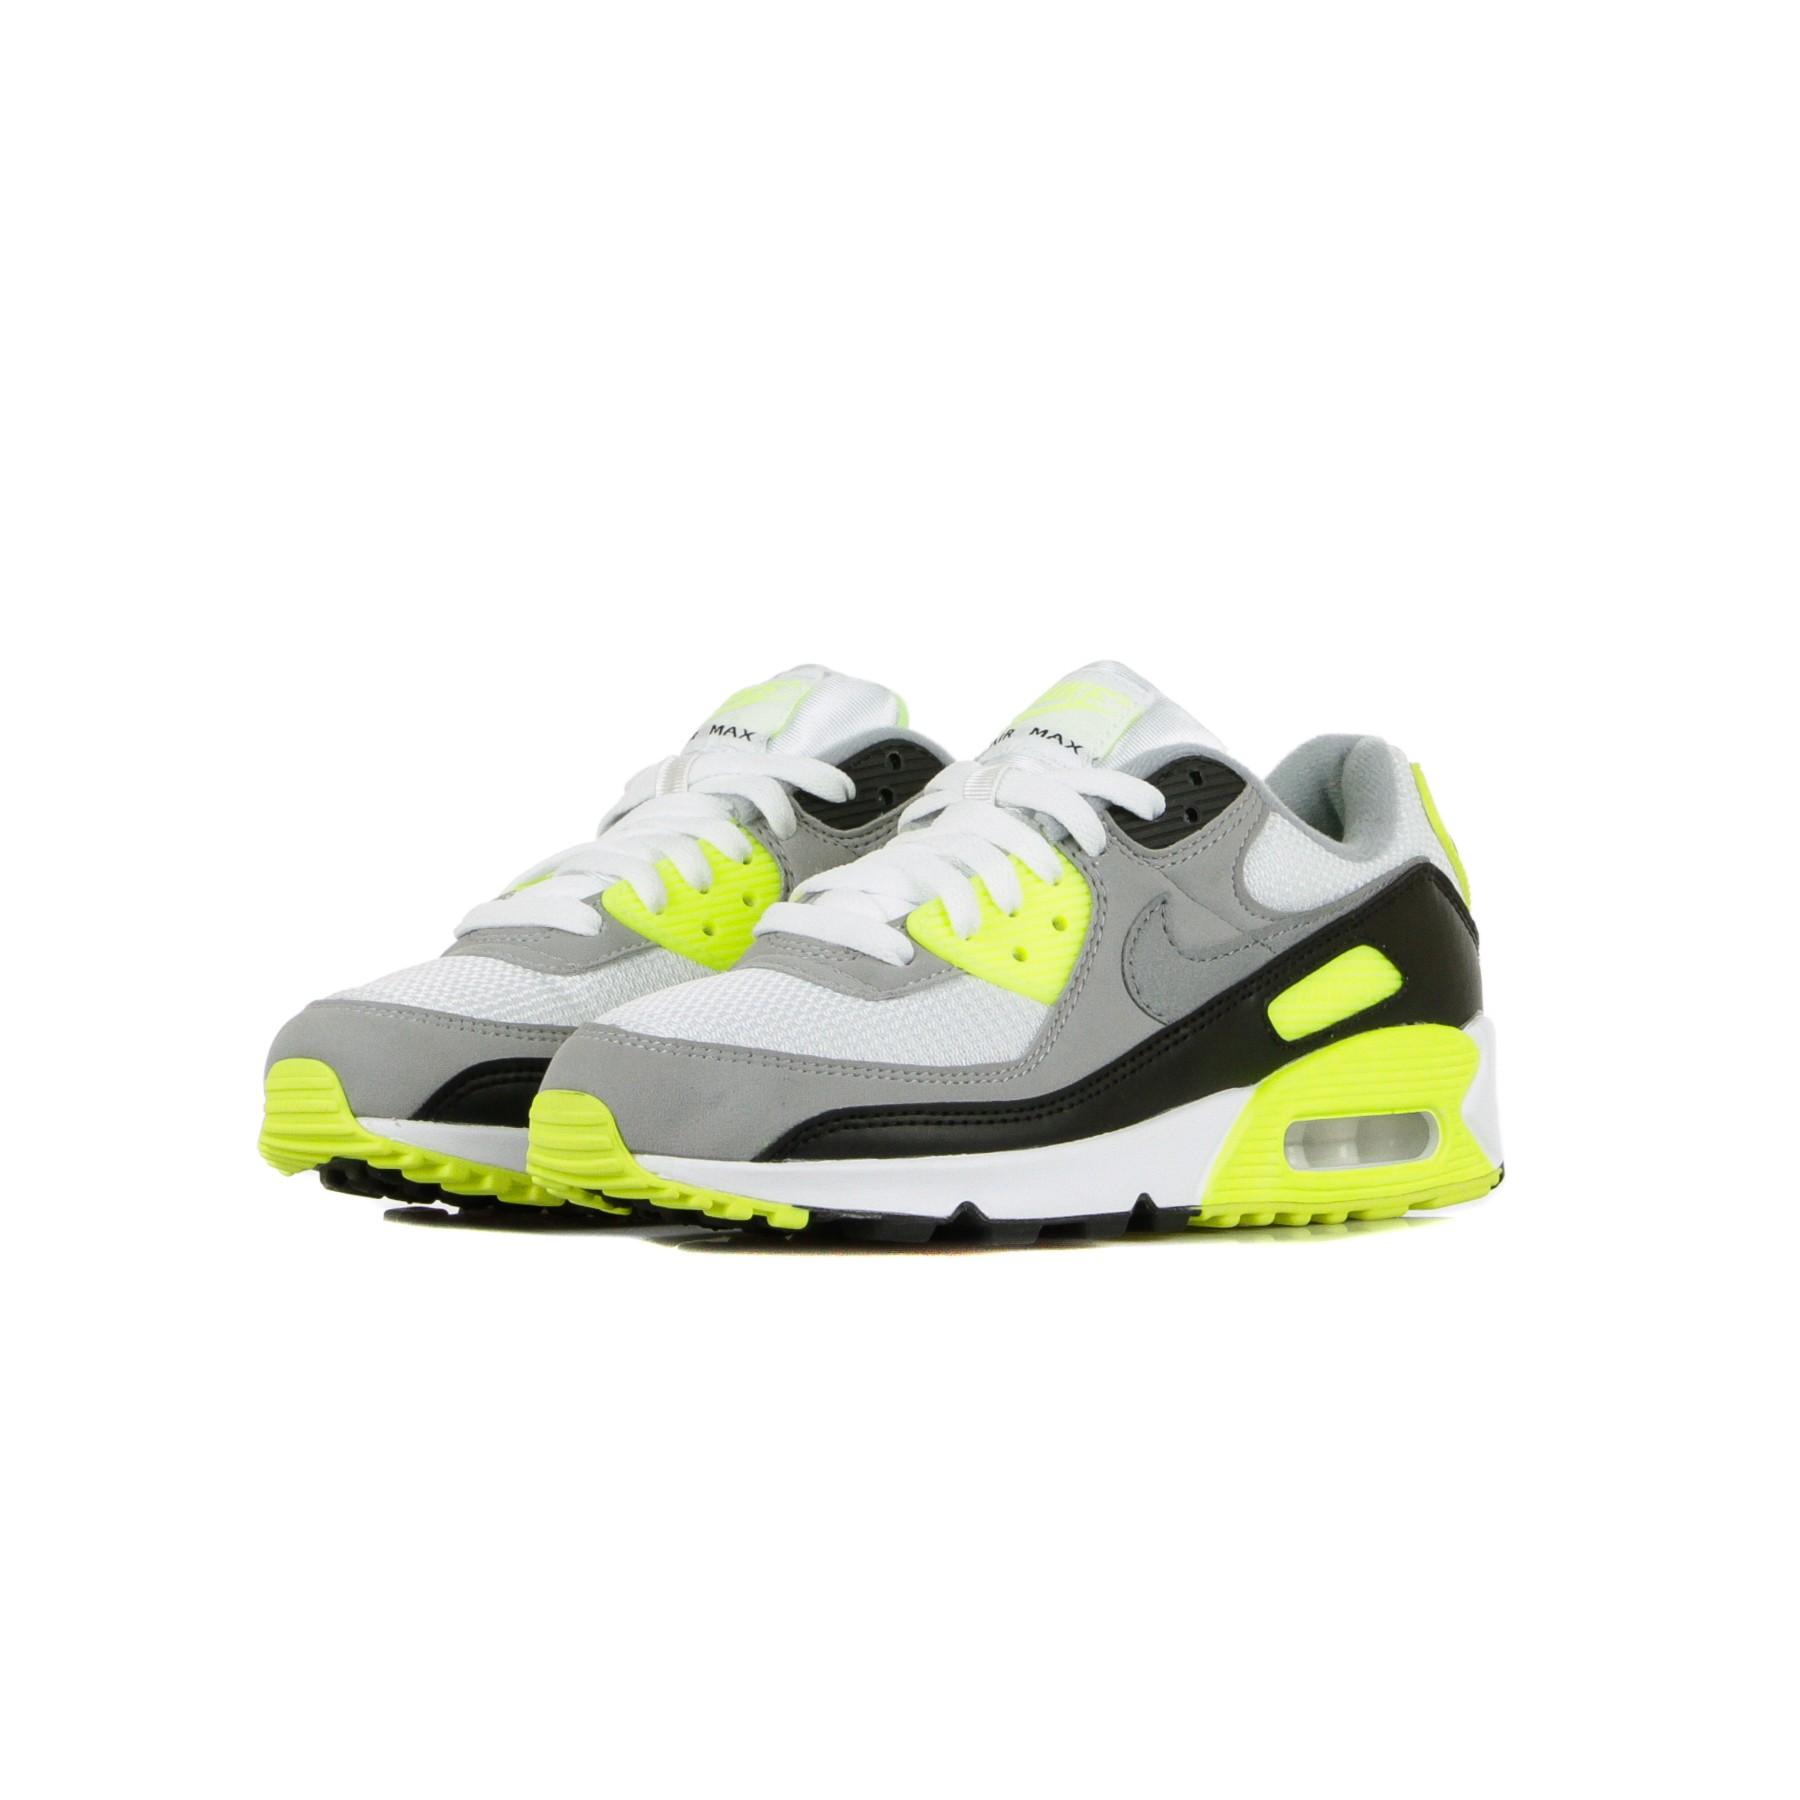 Nike Scarpa bassa uomo air max 90 CD0881-103   Atipicishop.com